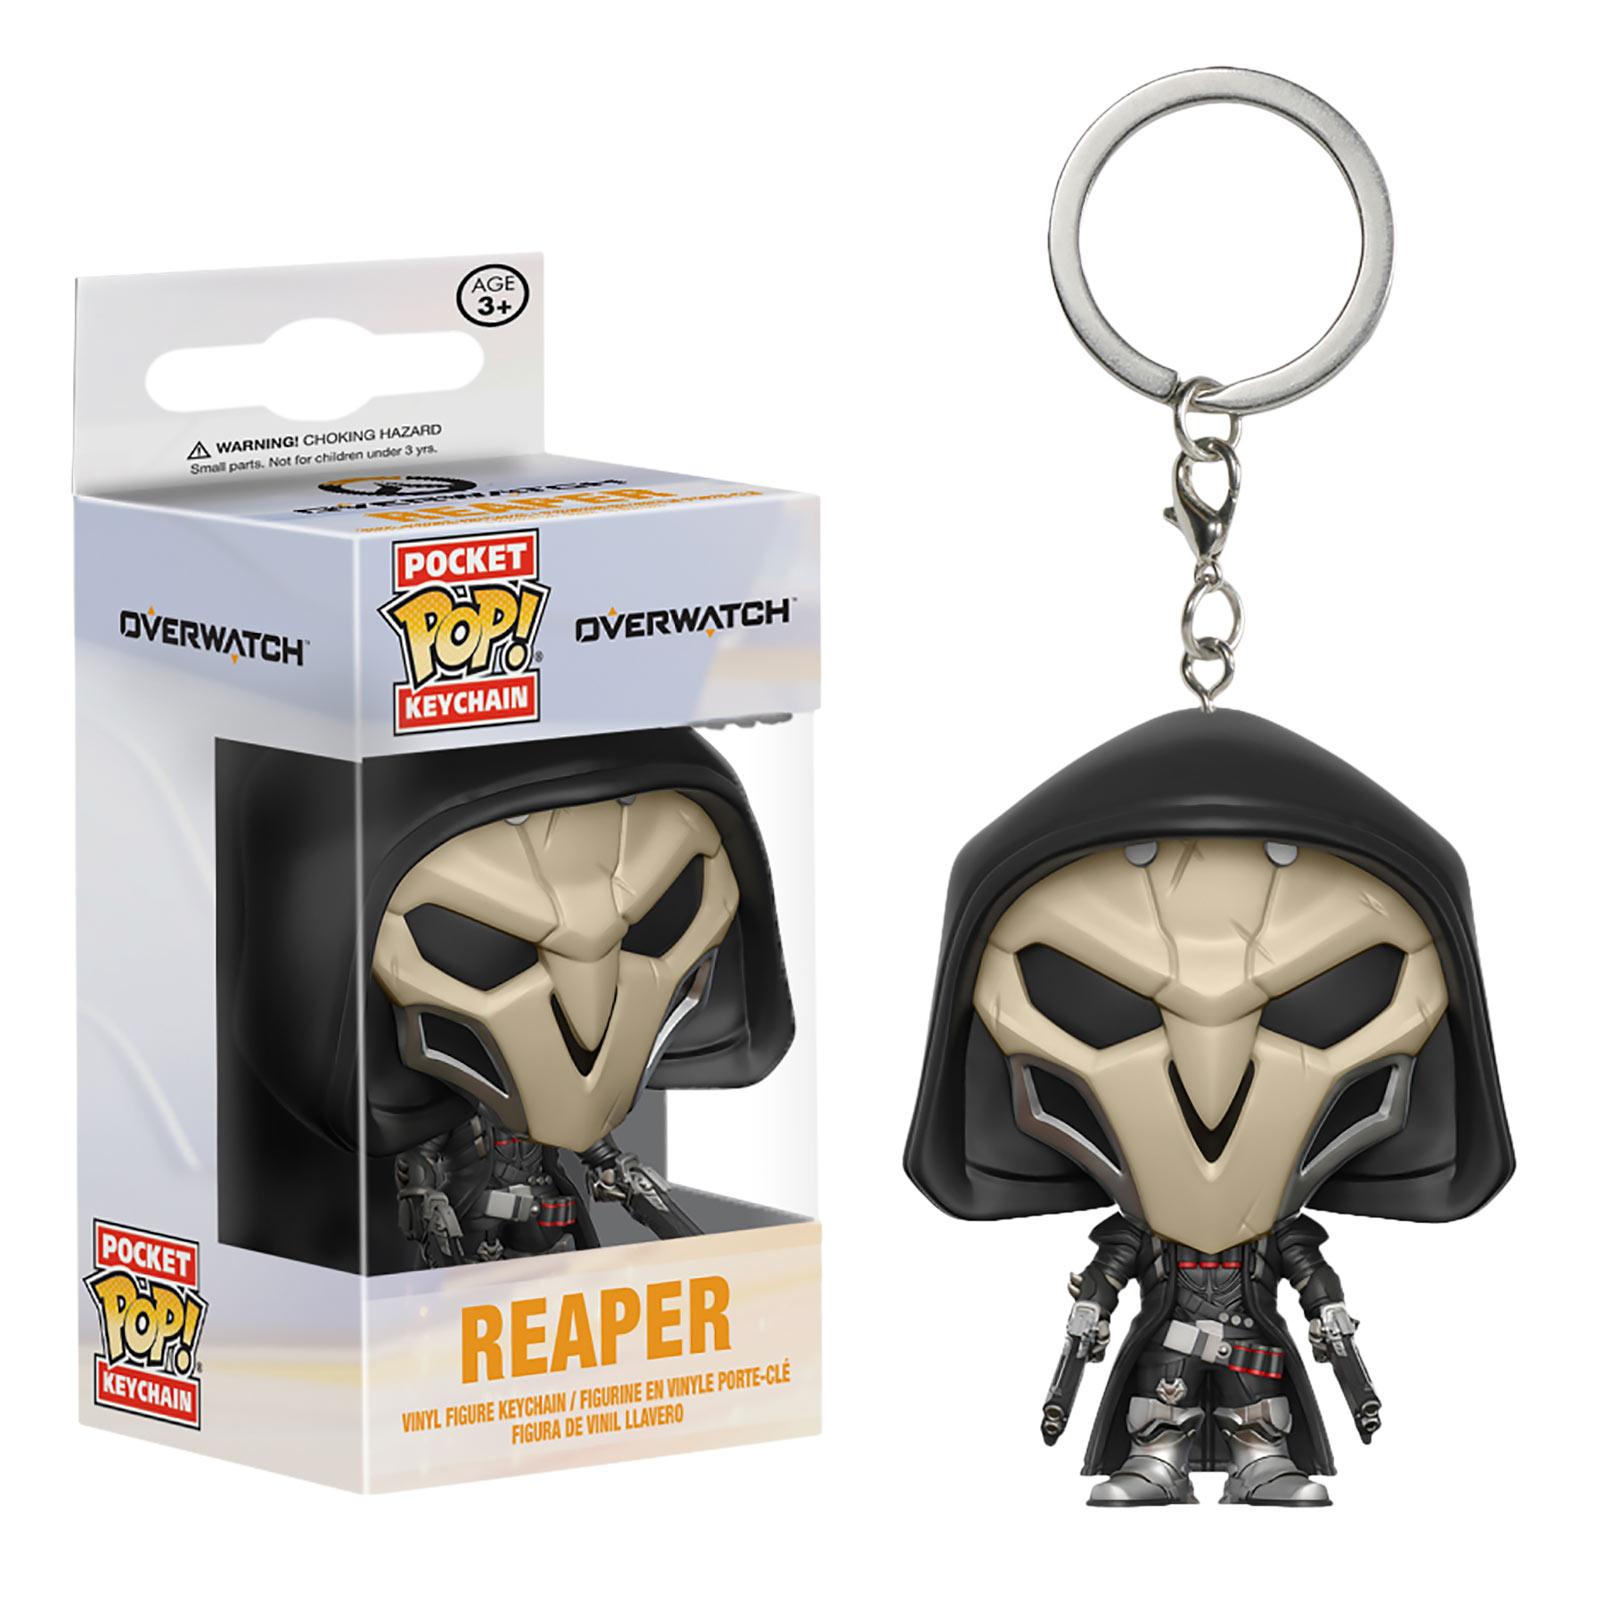 Overwatch - Reaper Funko Pop Schlüsselanhänger